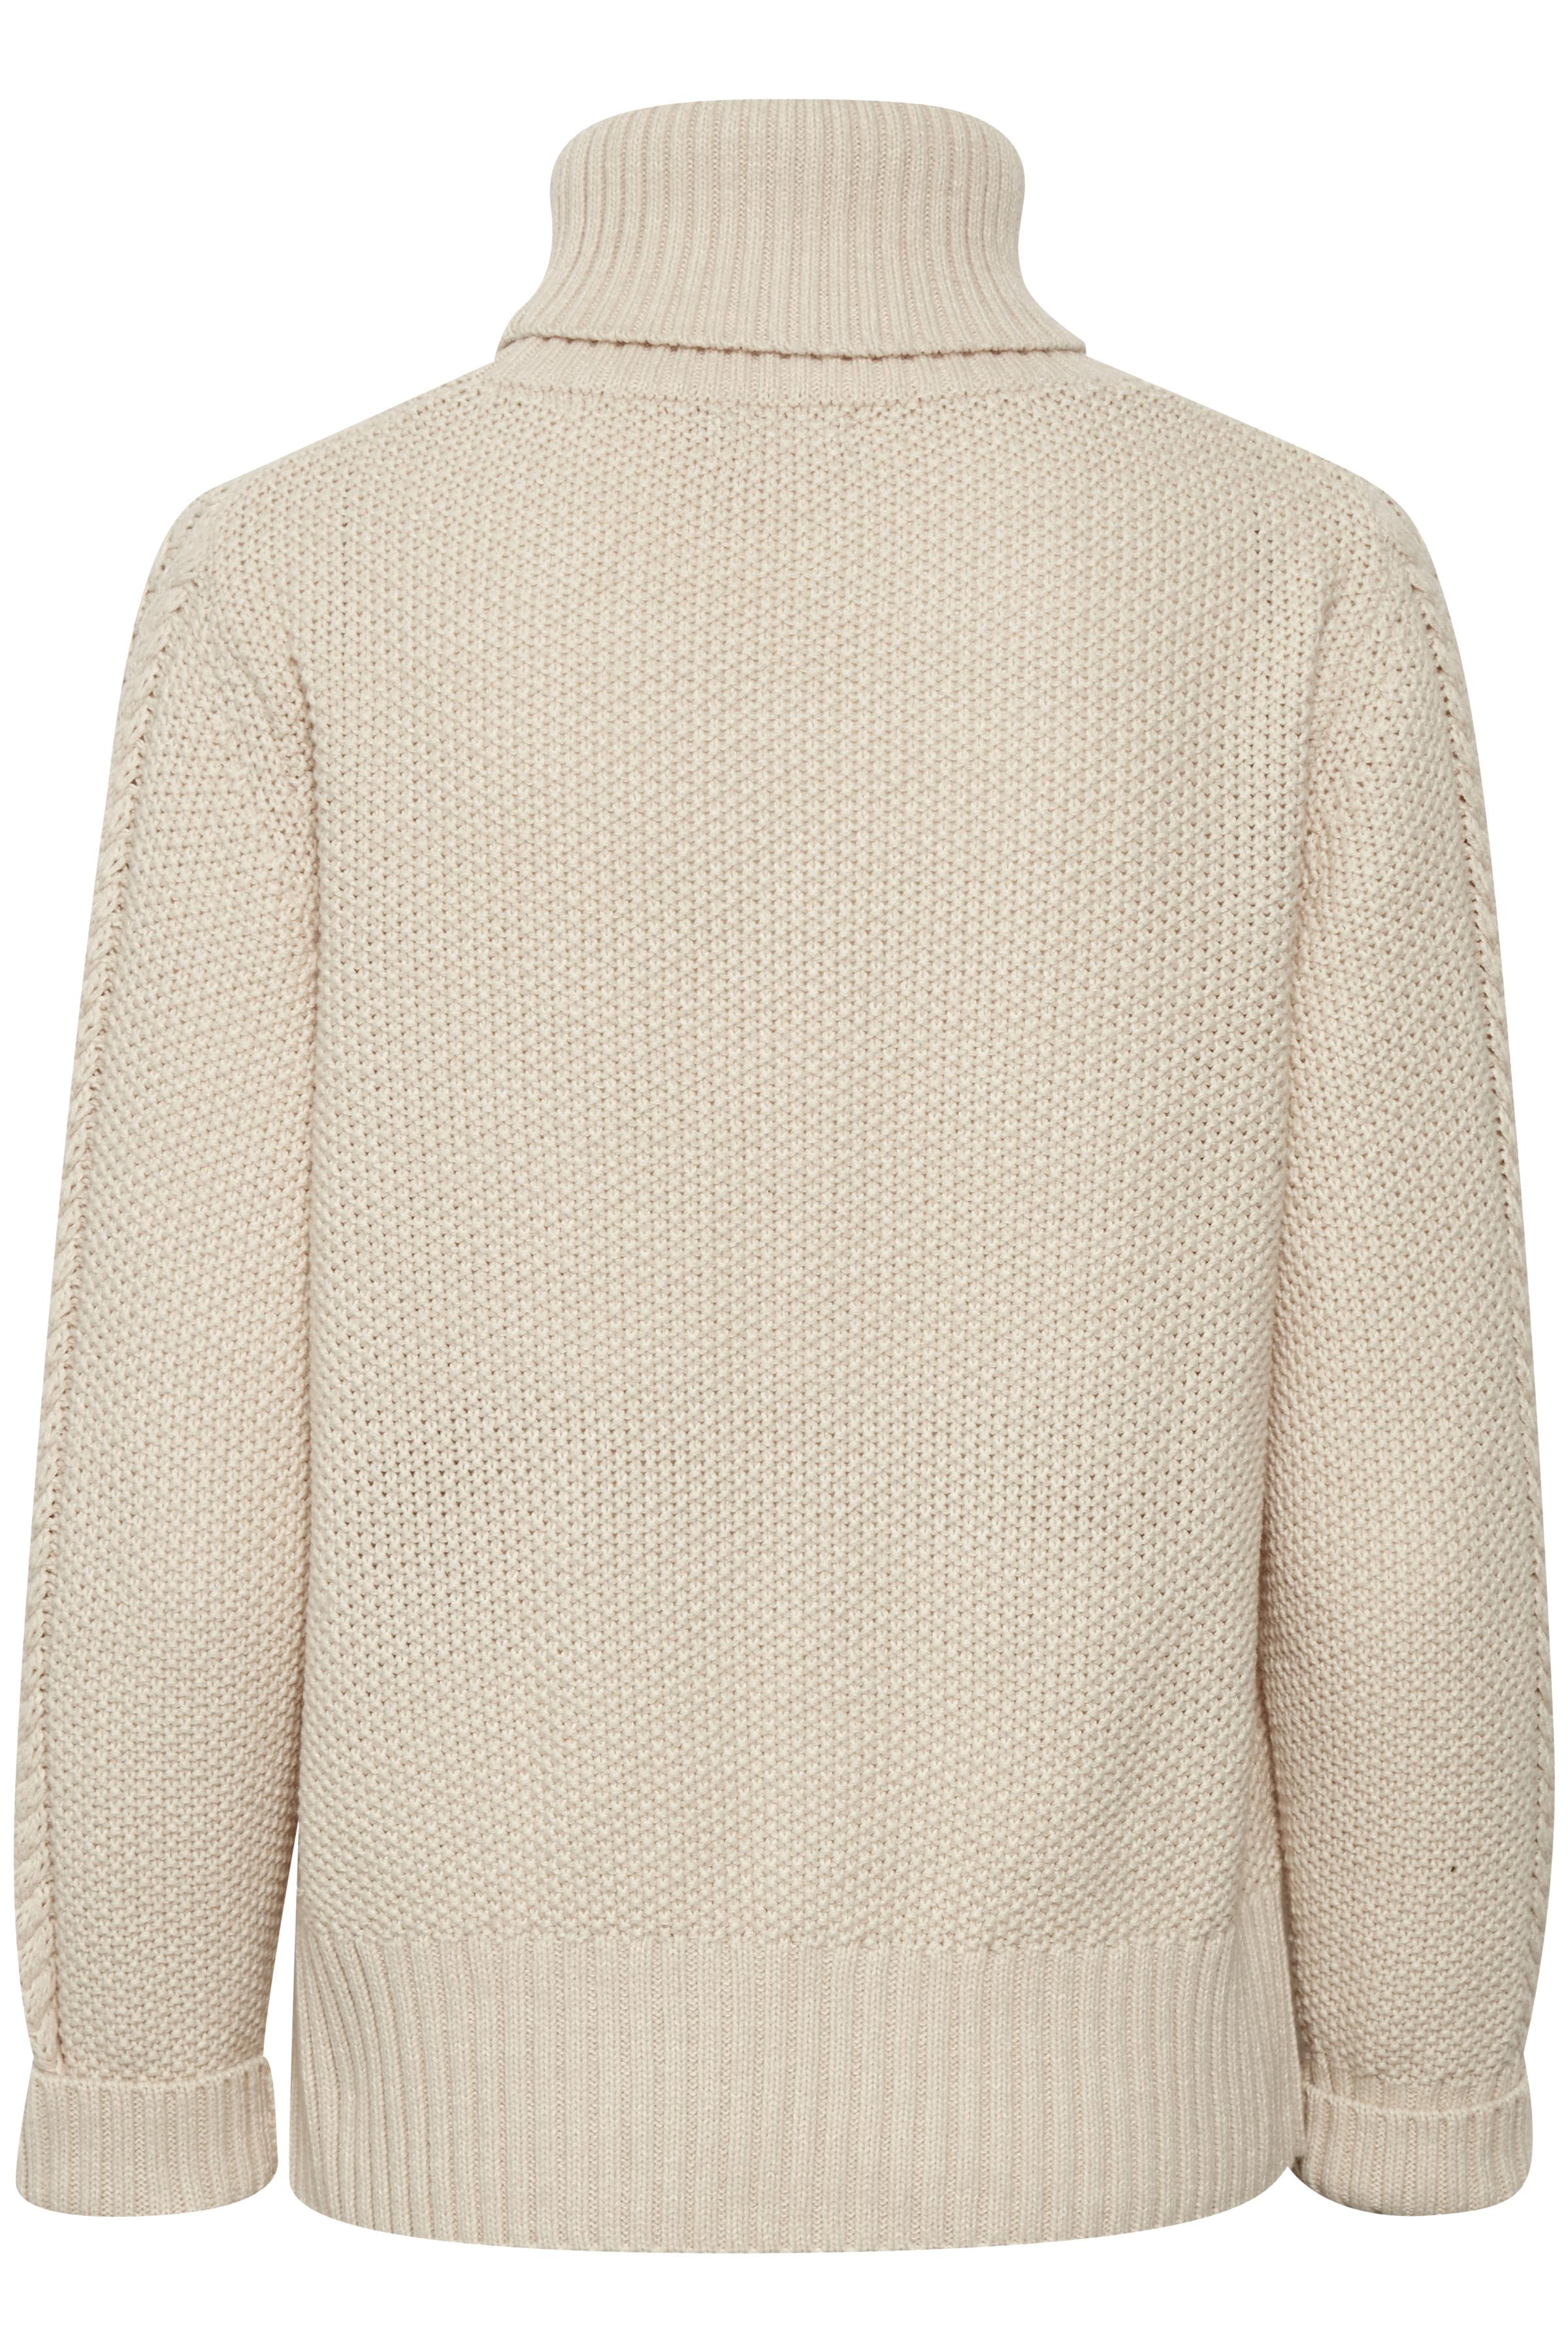 Crème Stickad pullover från Bon'A Parte – Köp Crème Stickad pullover från stl. S-2XL här